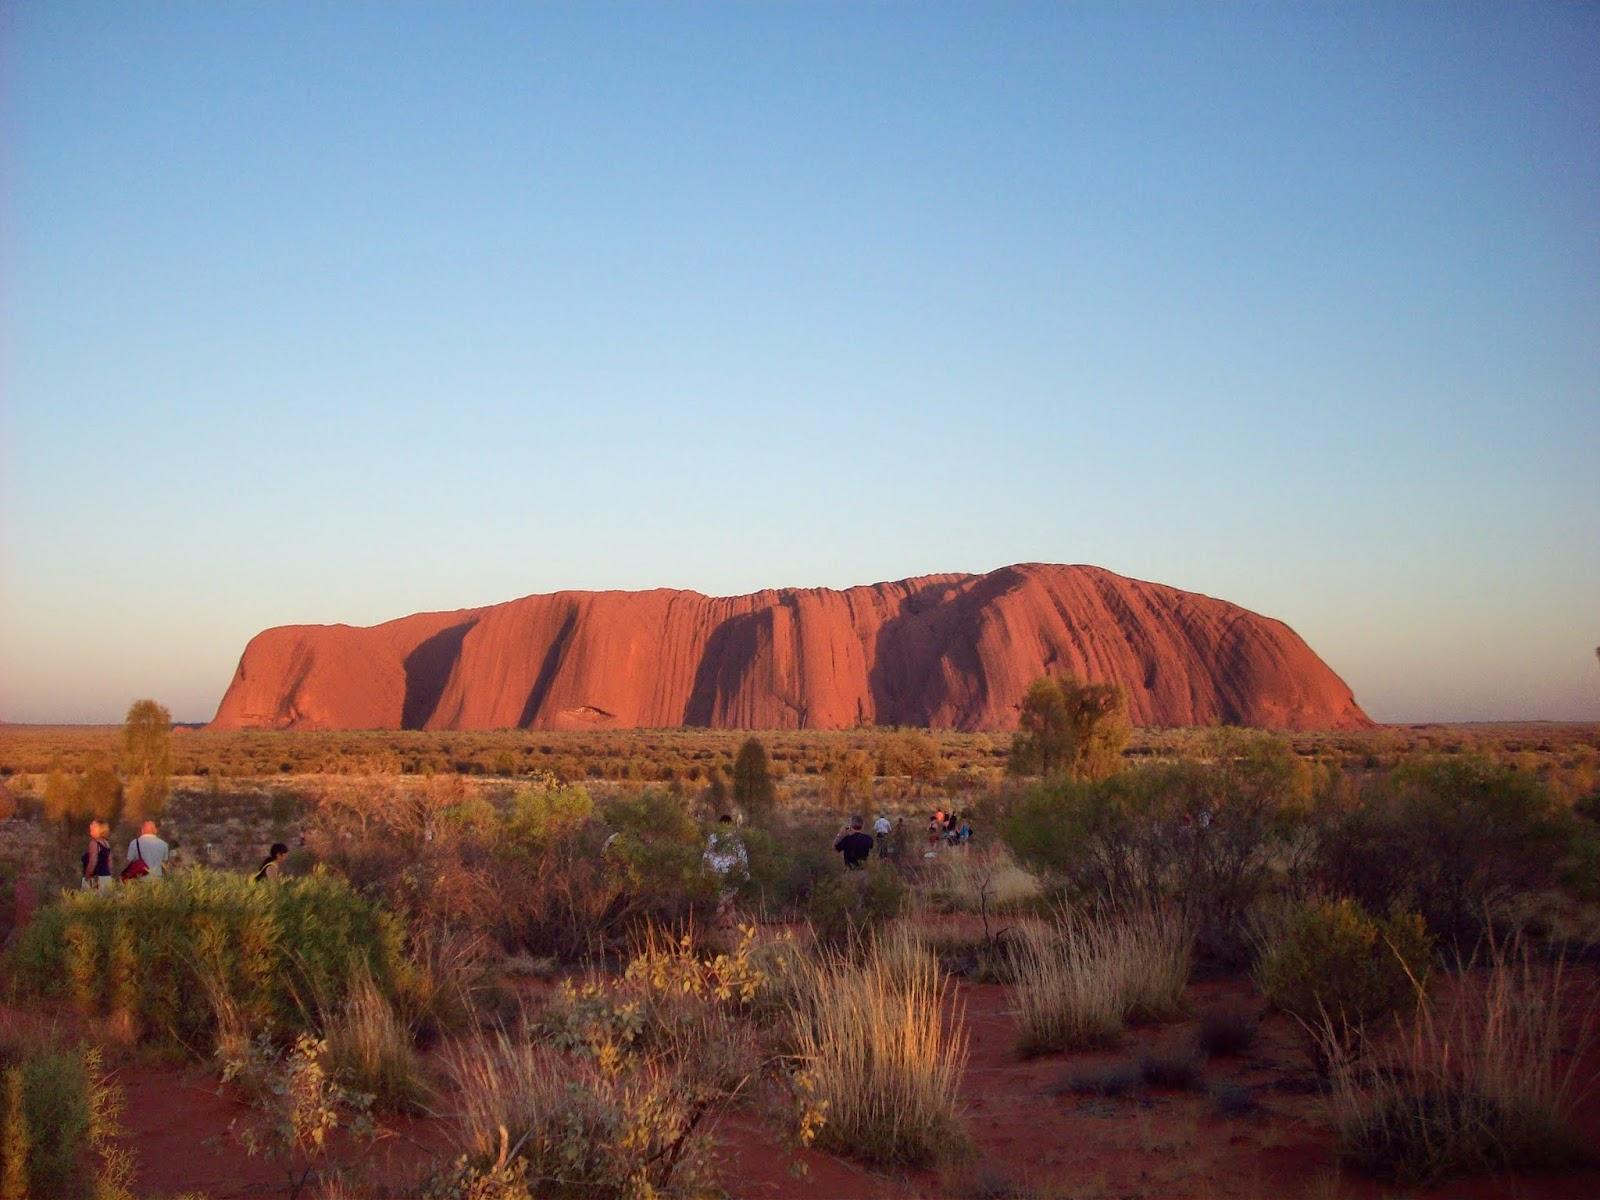 De_Uluru_Ayers_rock